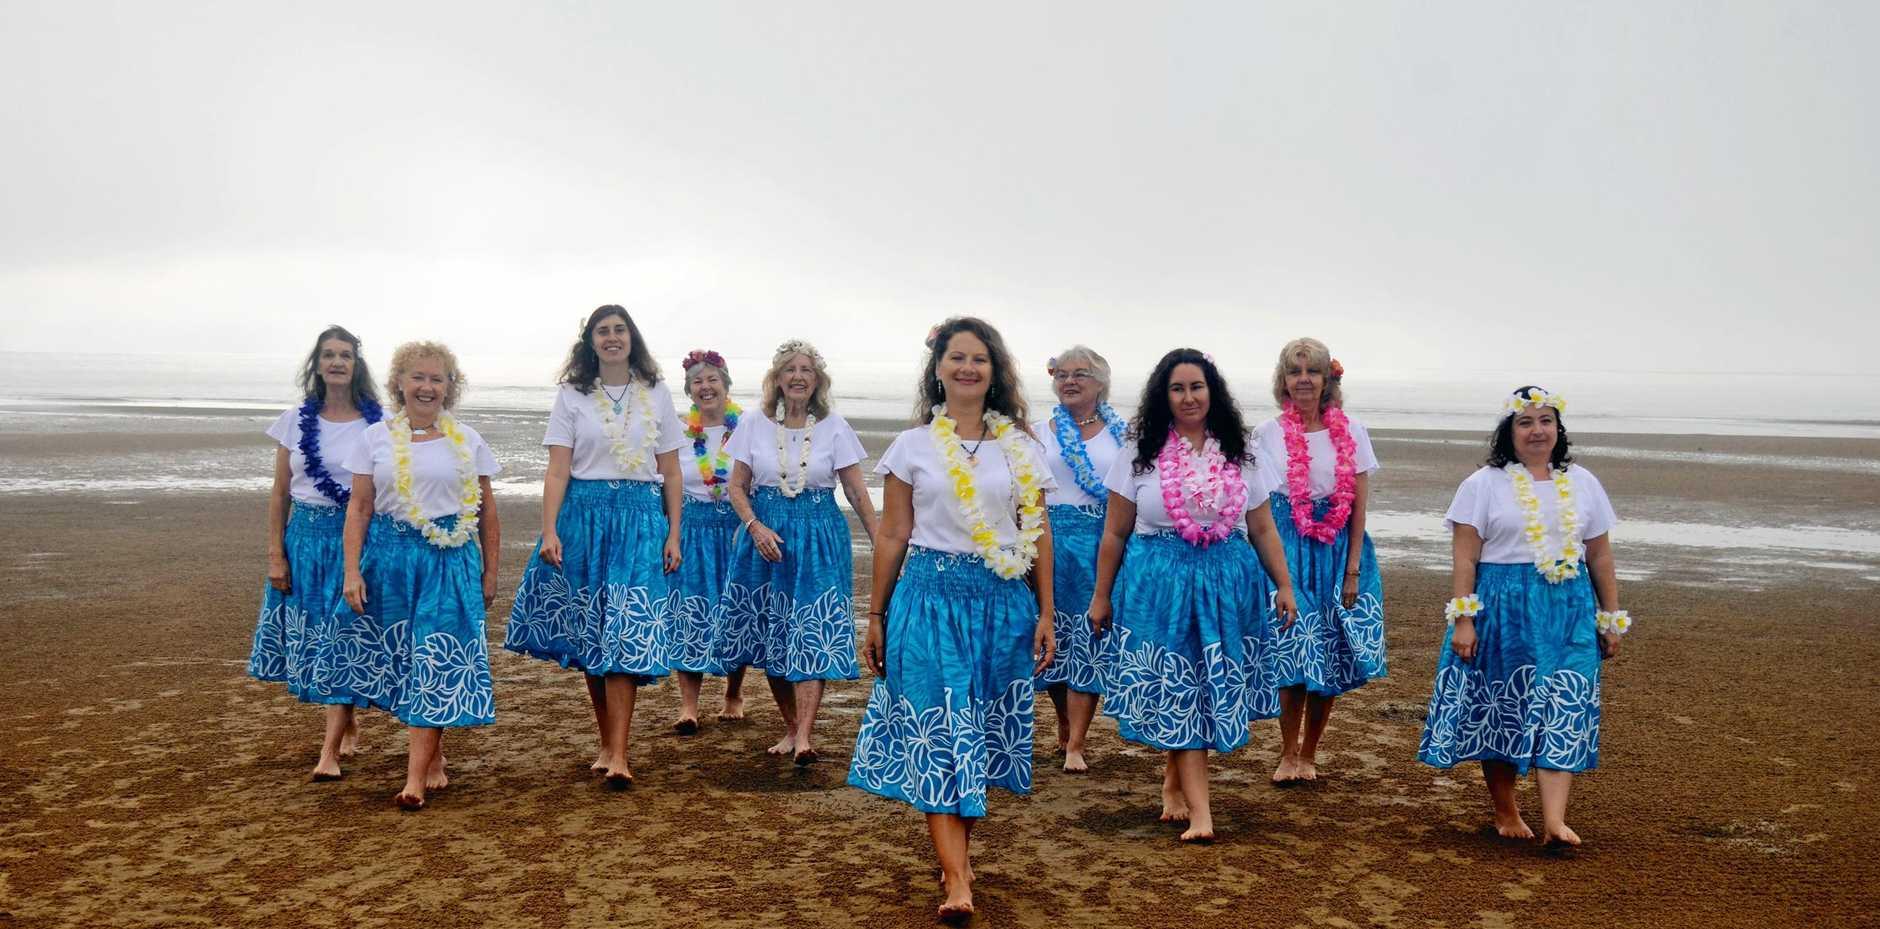 GET DANCING: Dance away your worries with Hawaiian Hula Dance Classes held every week in Hervey Bay.